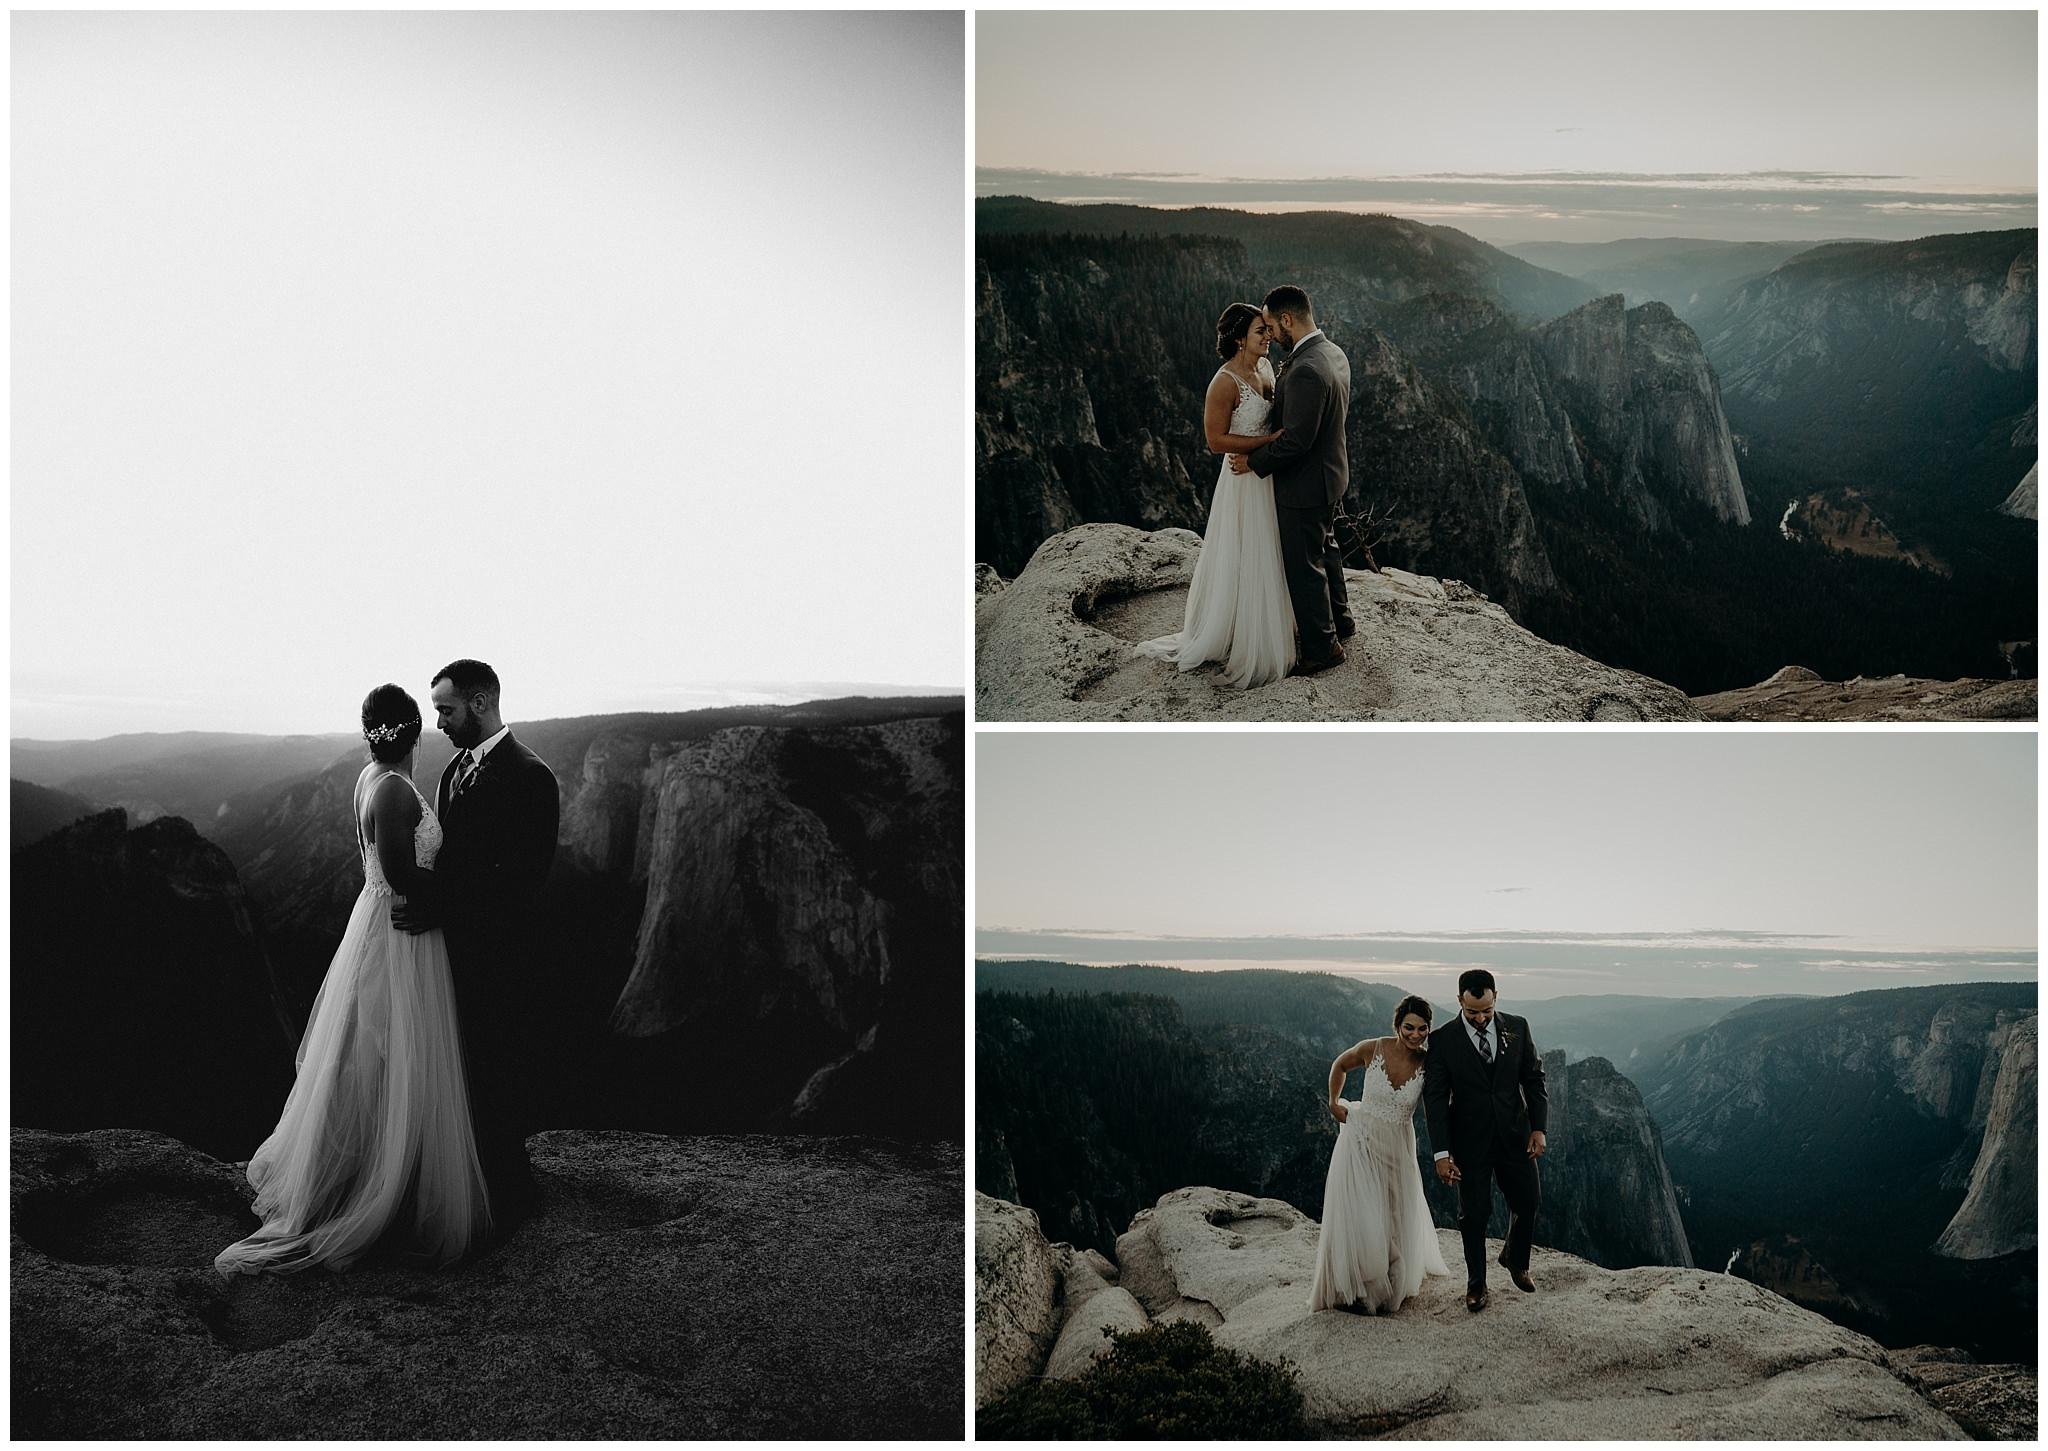 yosemite-national-park-wedding7.jpg